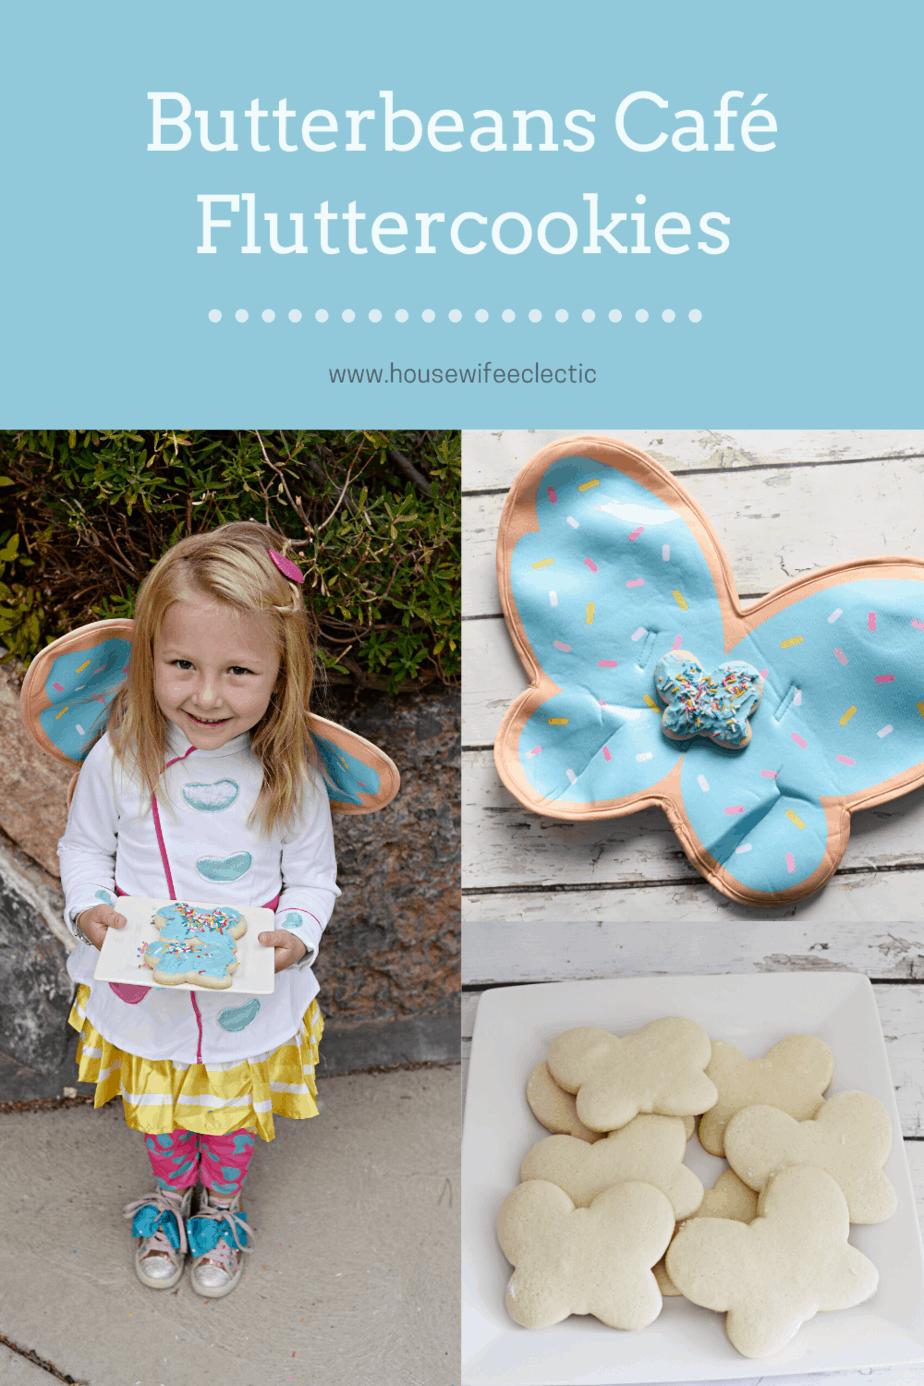 Housewife Eclectic: Butterbeans Café Fluttercookies